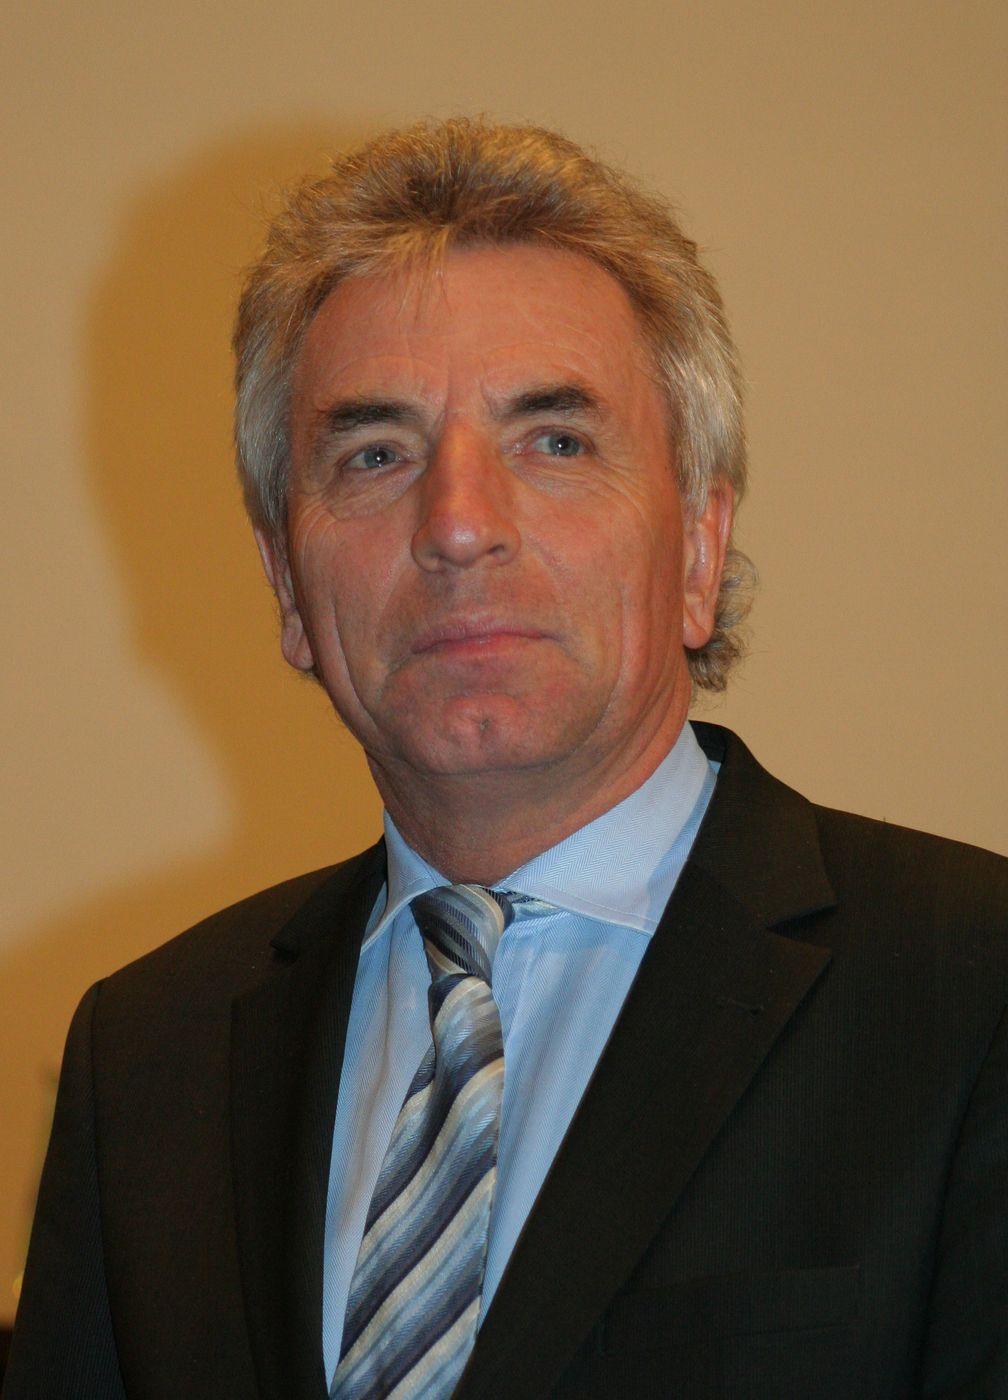 Jürgen Roters 2010